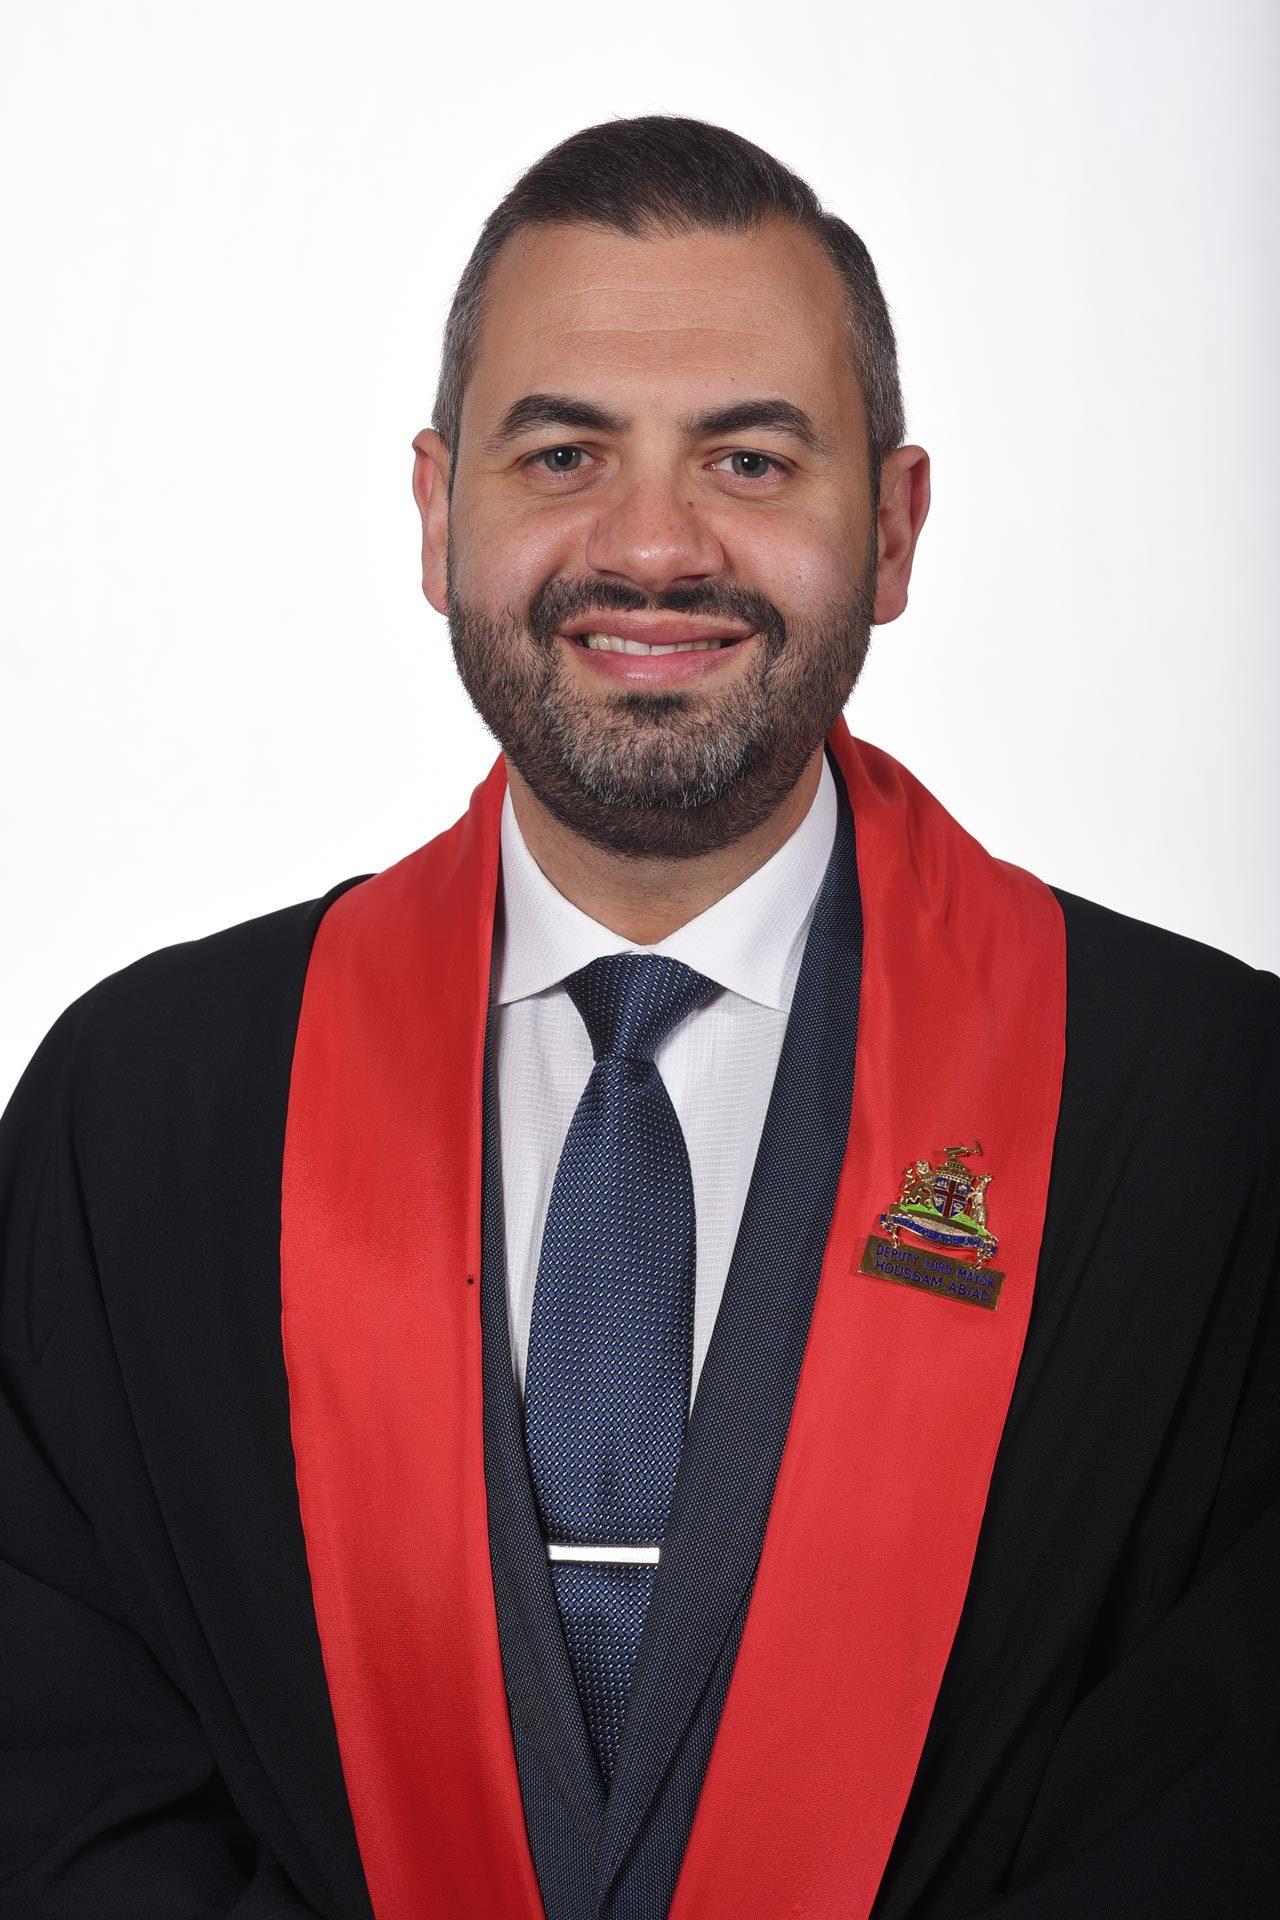 Councillor Houssam Abiad